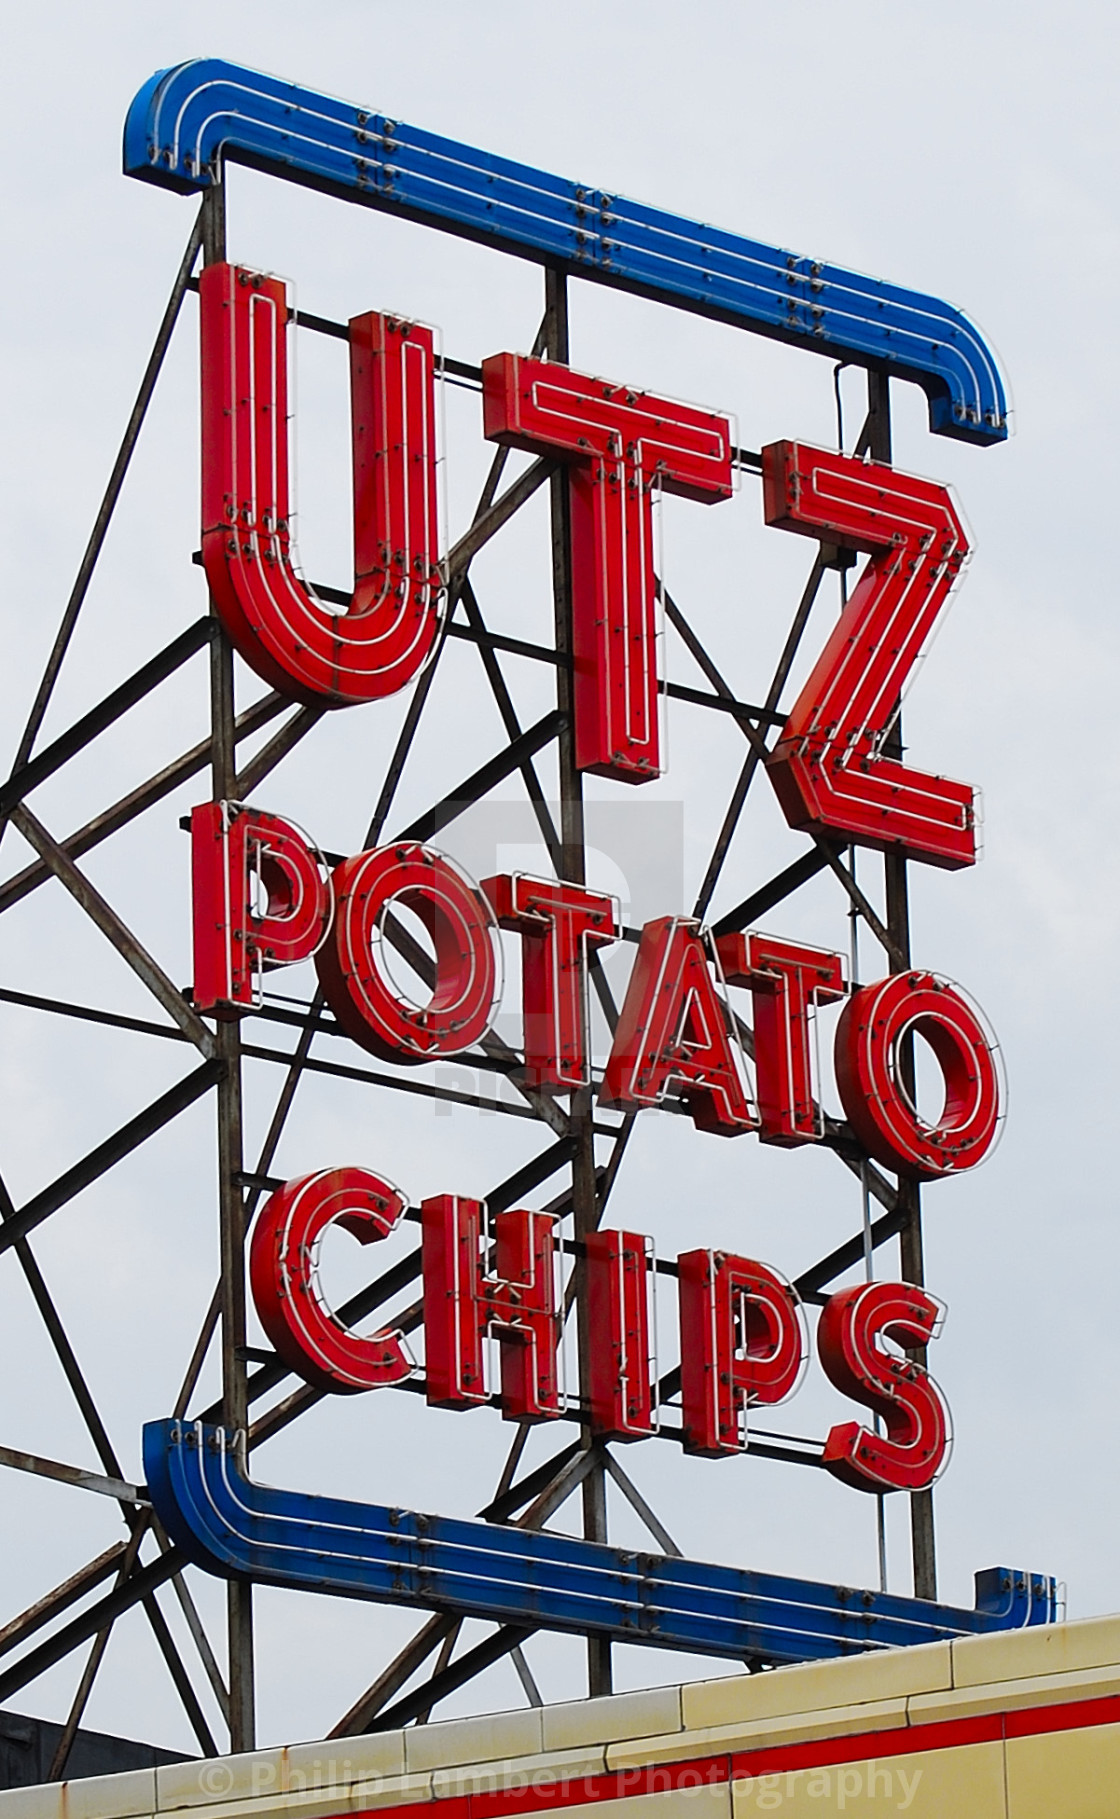 """Utz Potato Chips"" stock image"